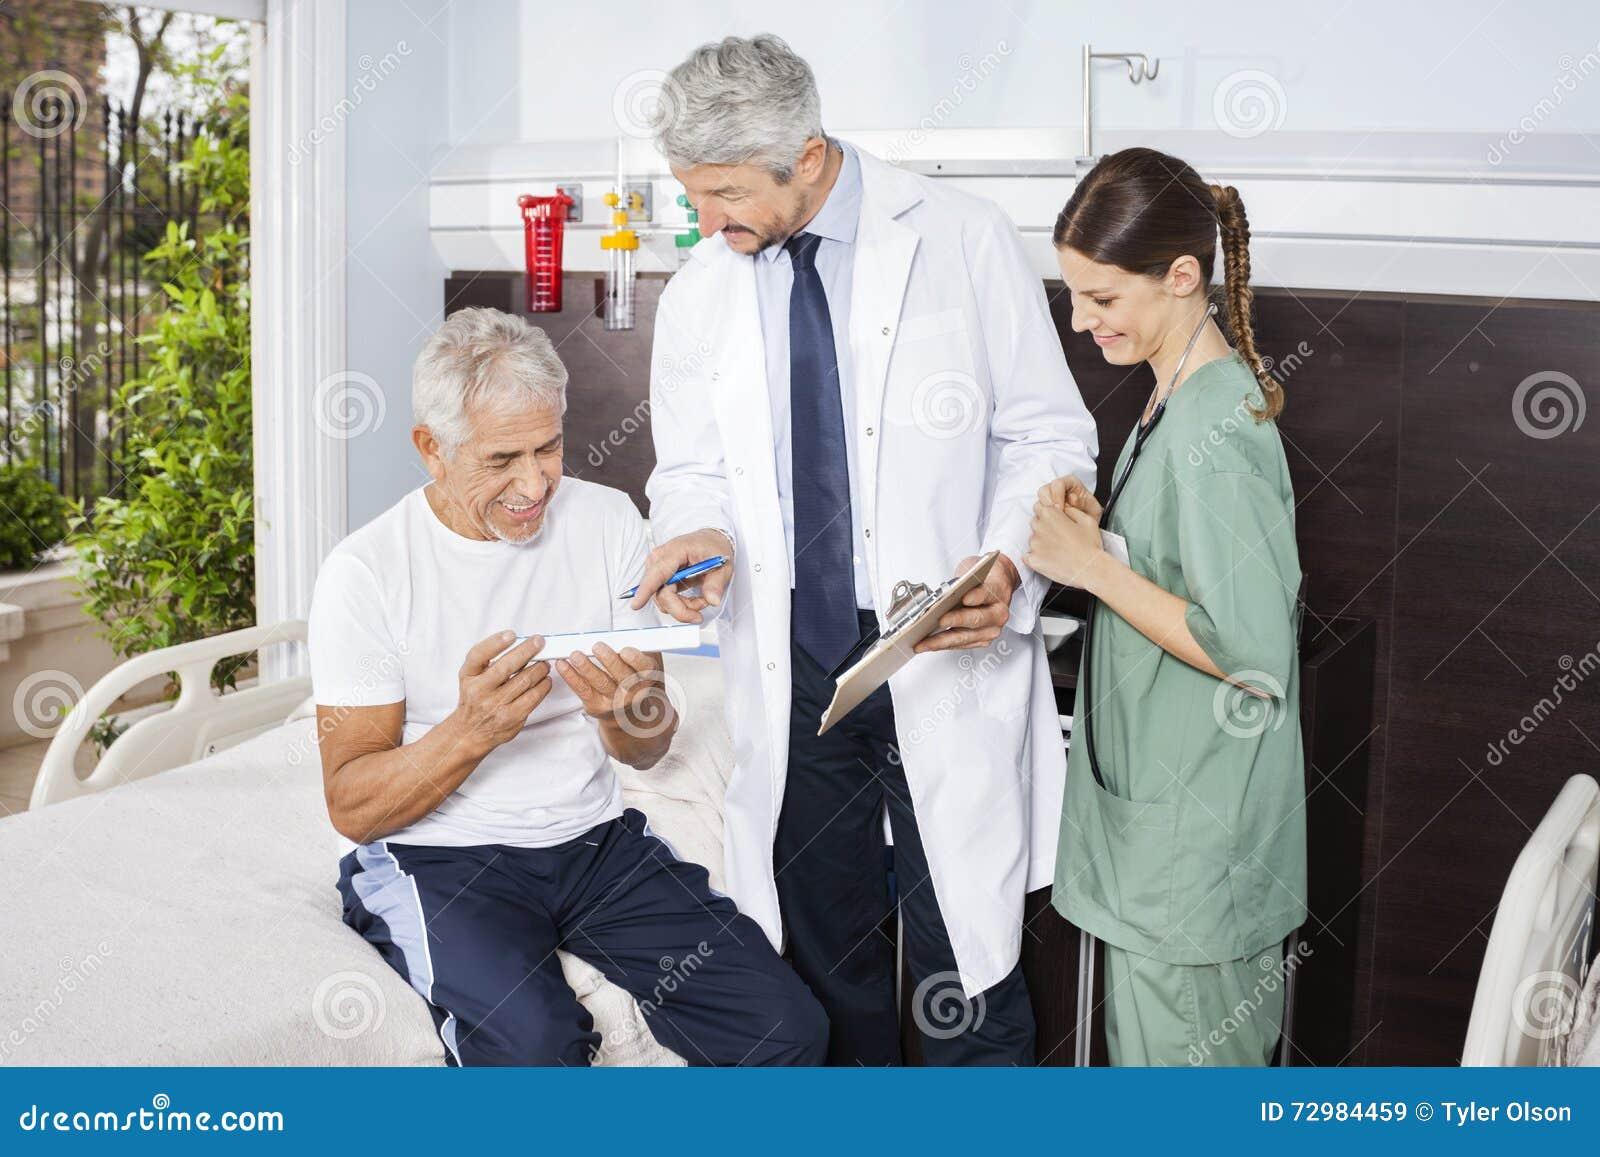 Nurse Looking At Doctor Explaining Prescription To Patient